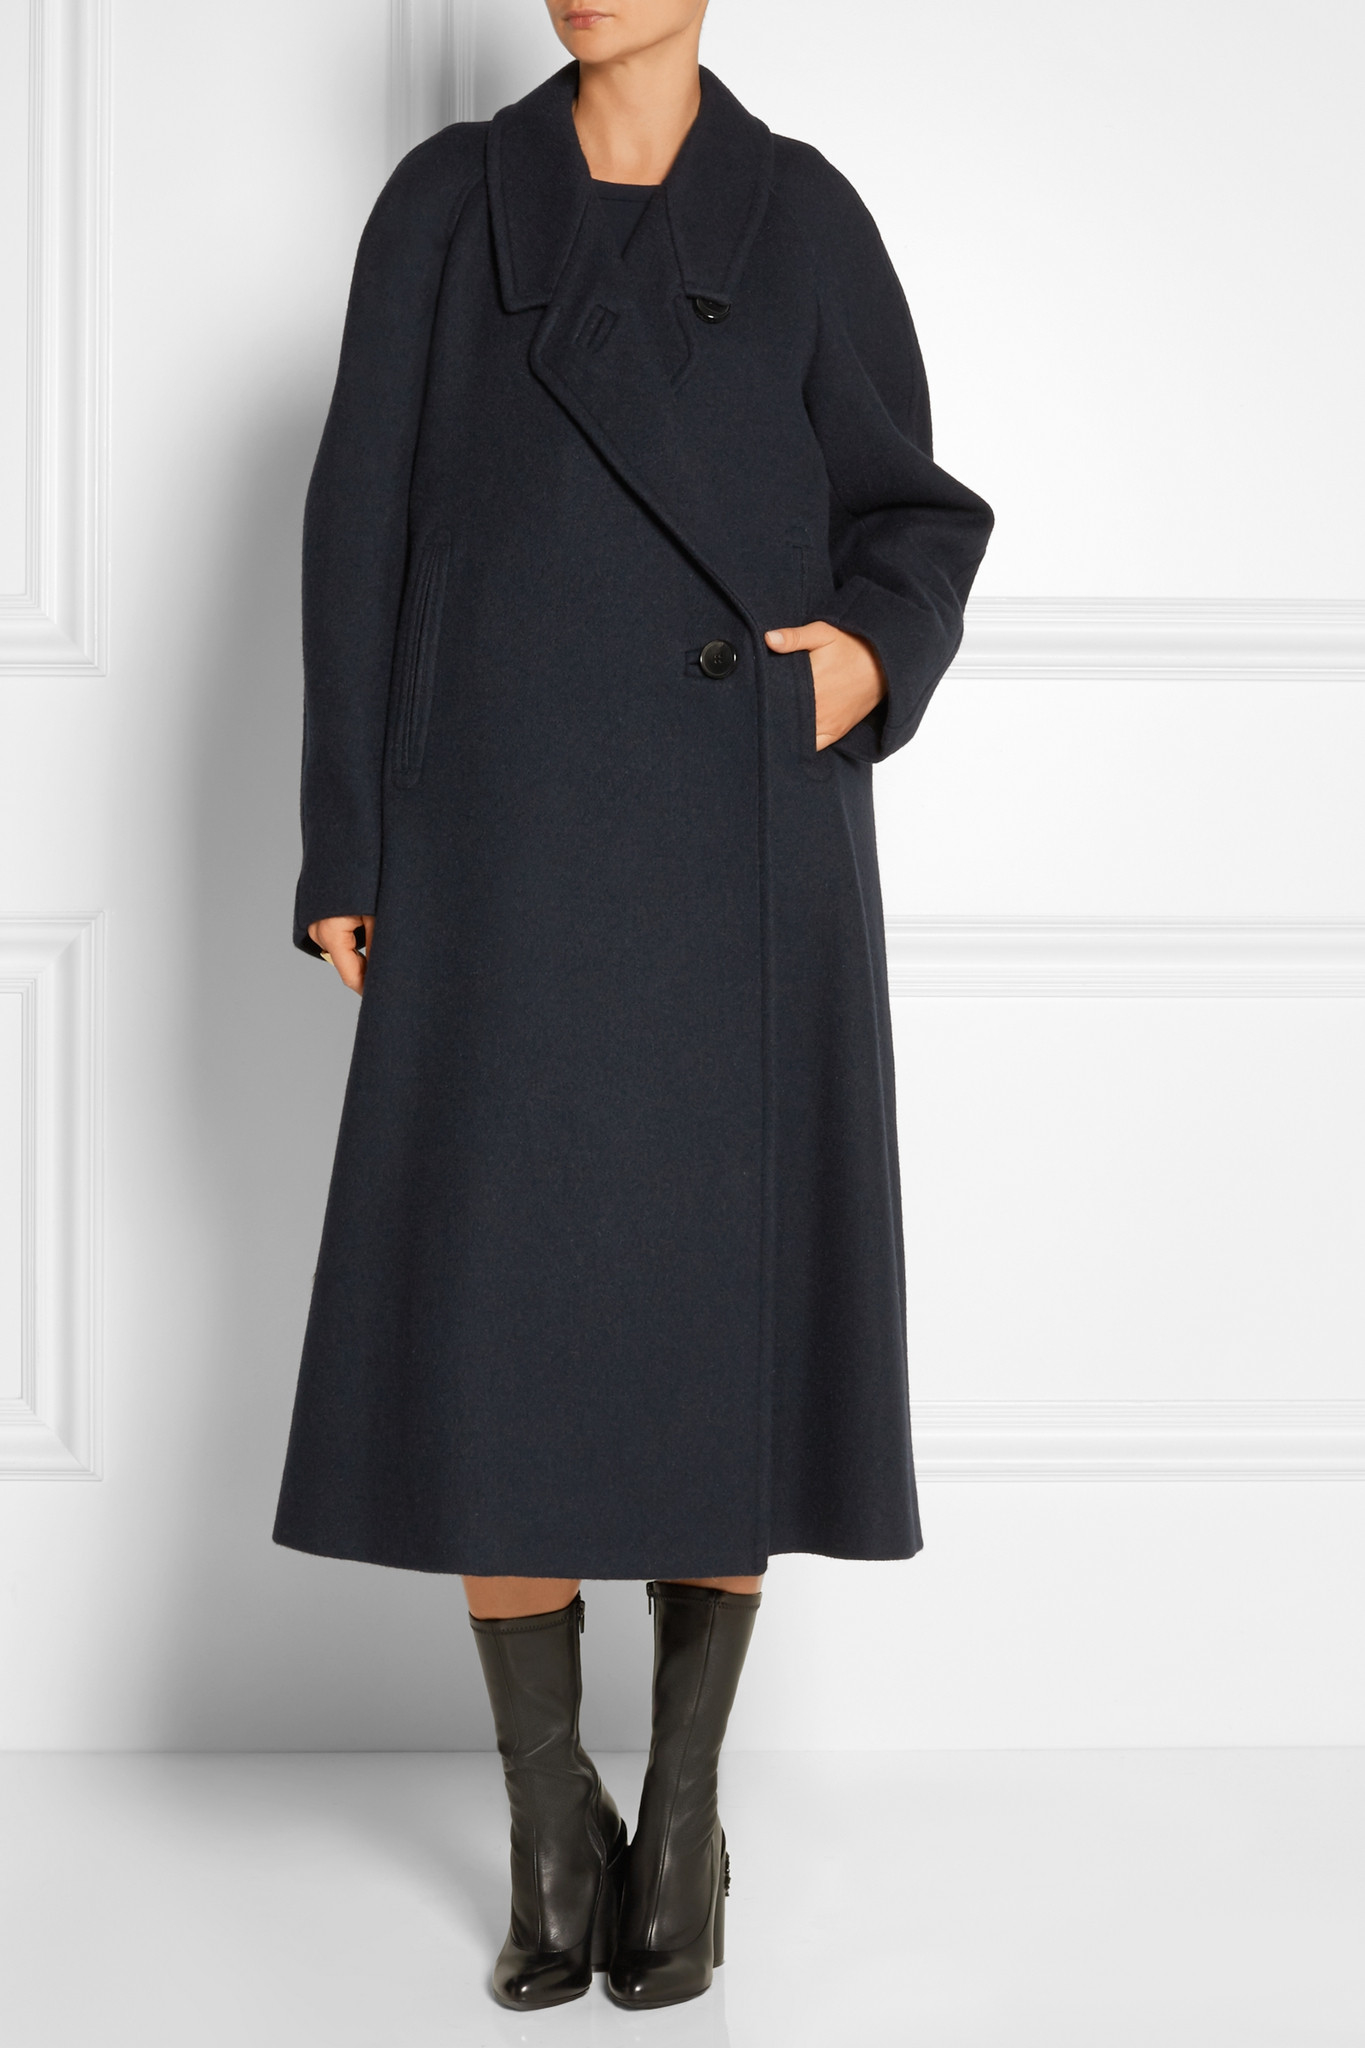 Lemaire Oversized Melton Wool Coat in Blue | Lyst